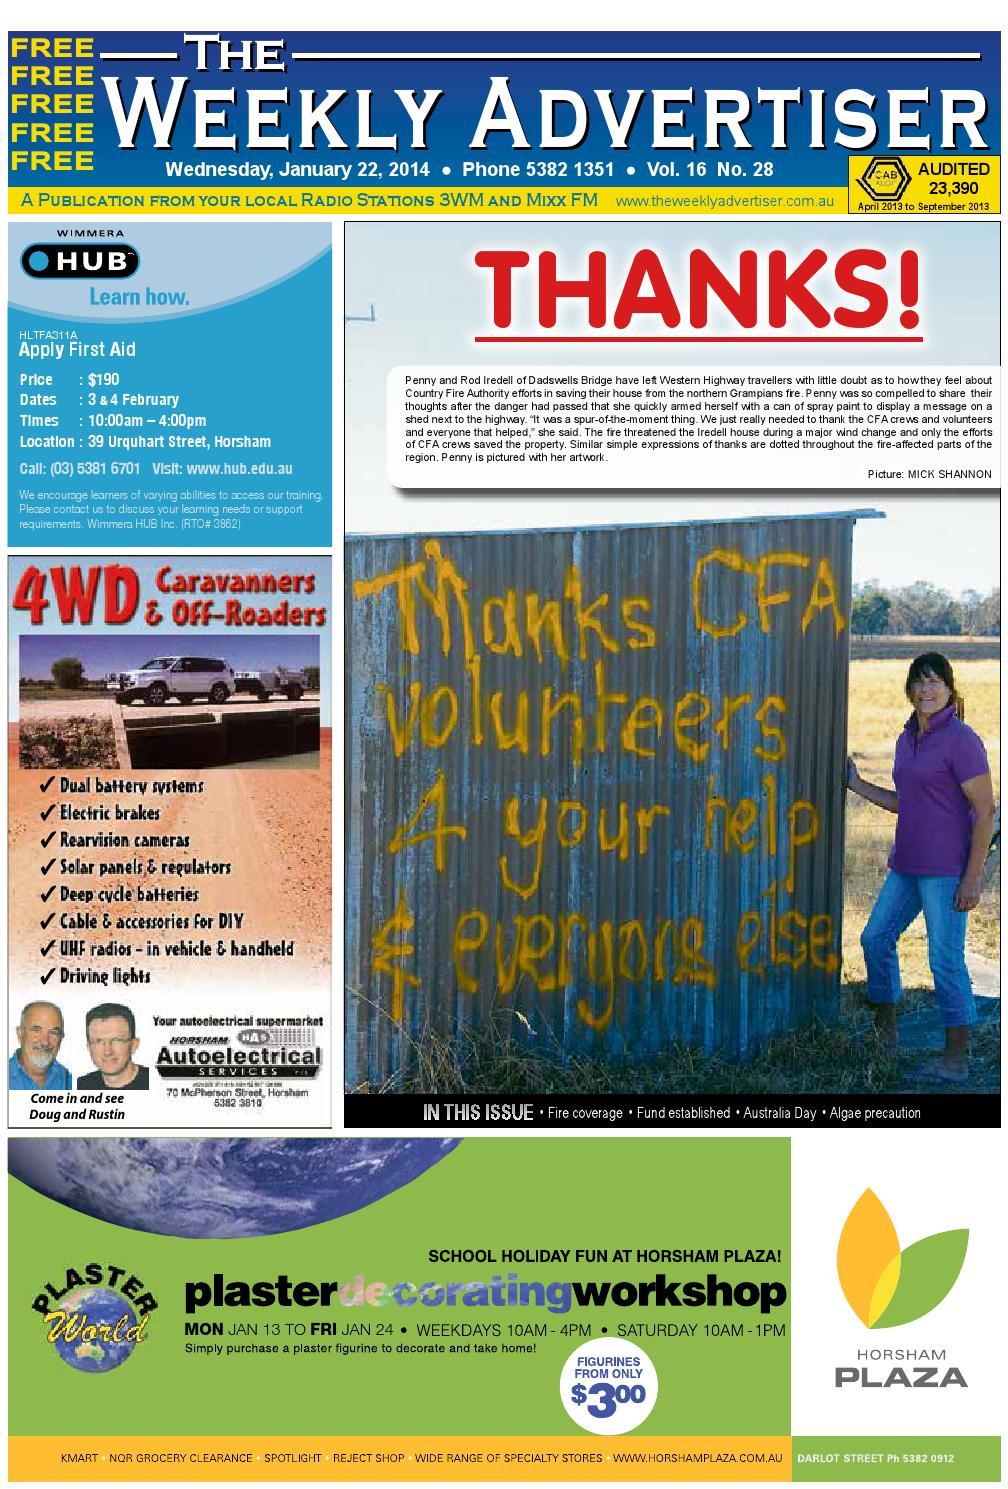 b71045951c9 The Weekly Advertiser - Wednesday